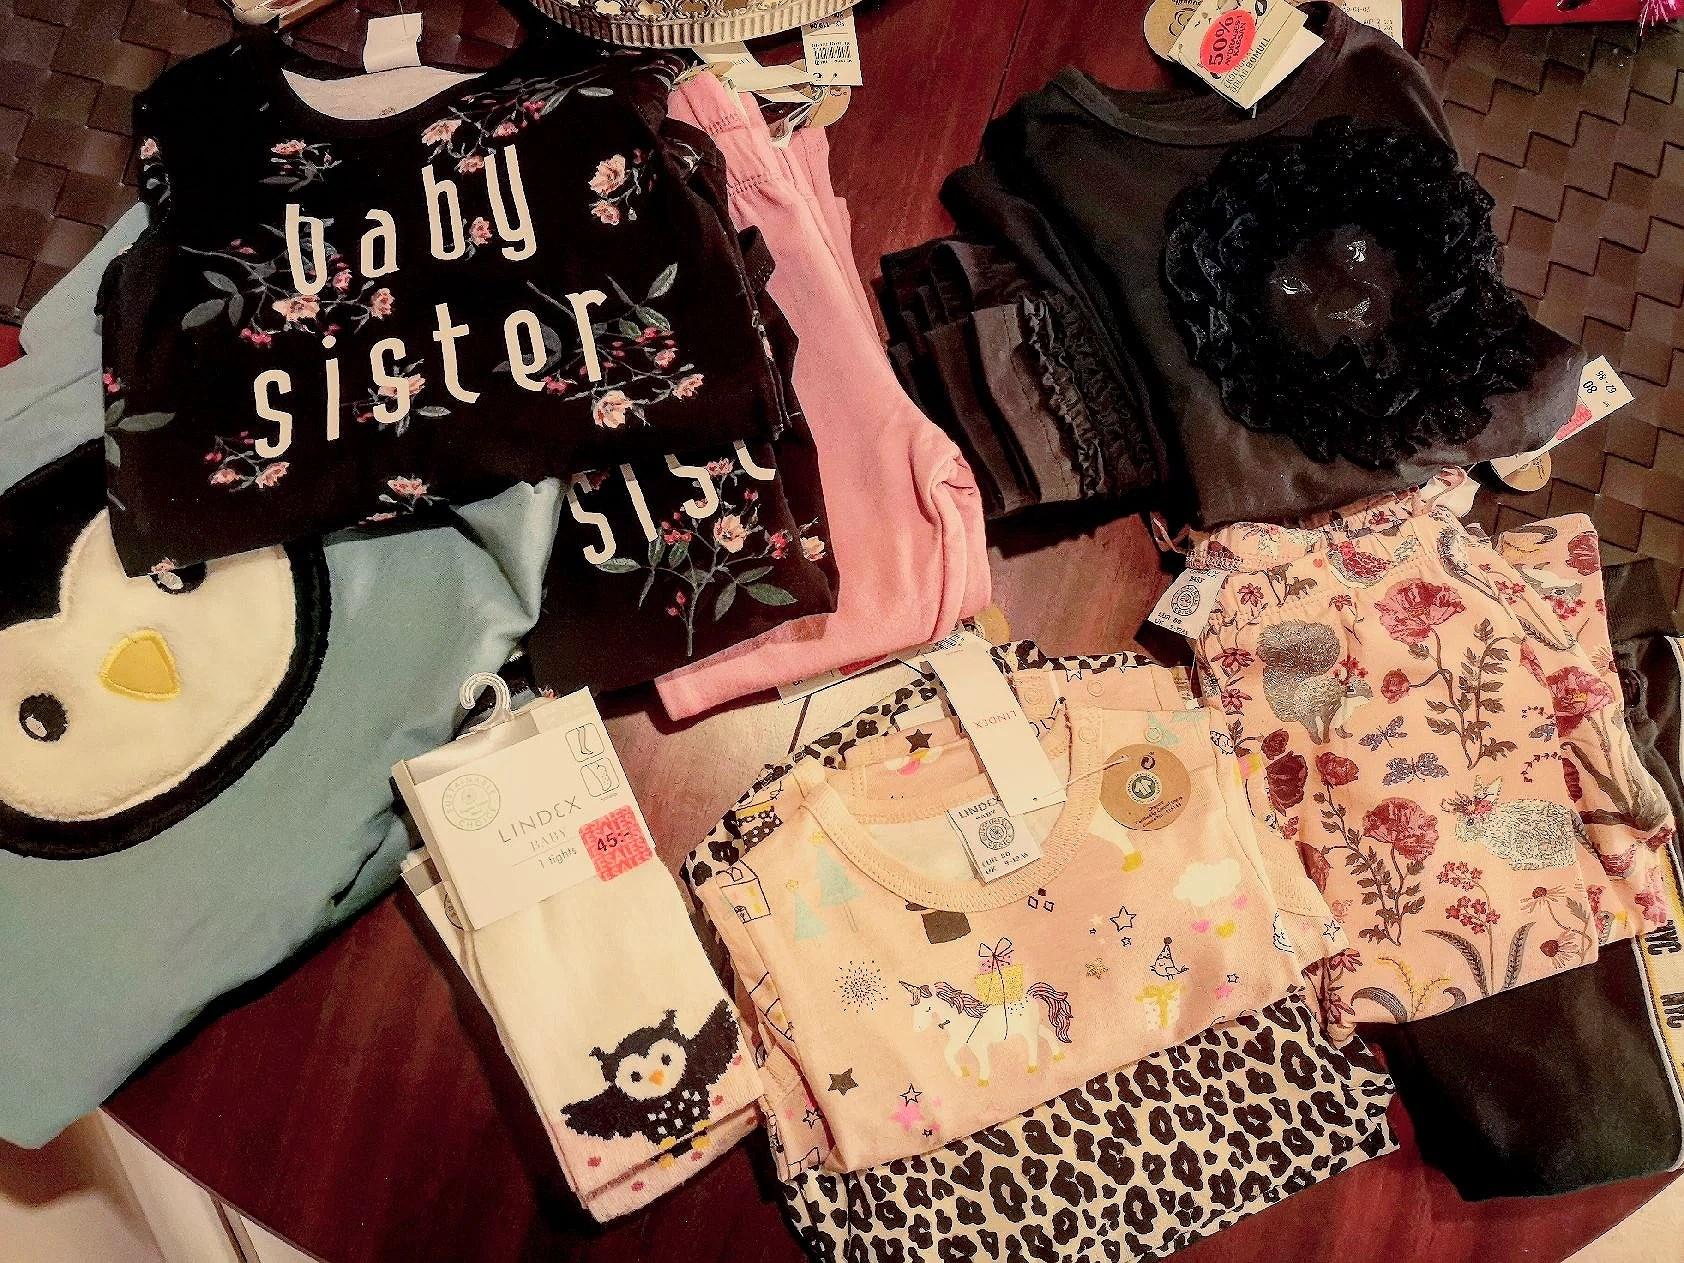 Nyinköpta babykläder